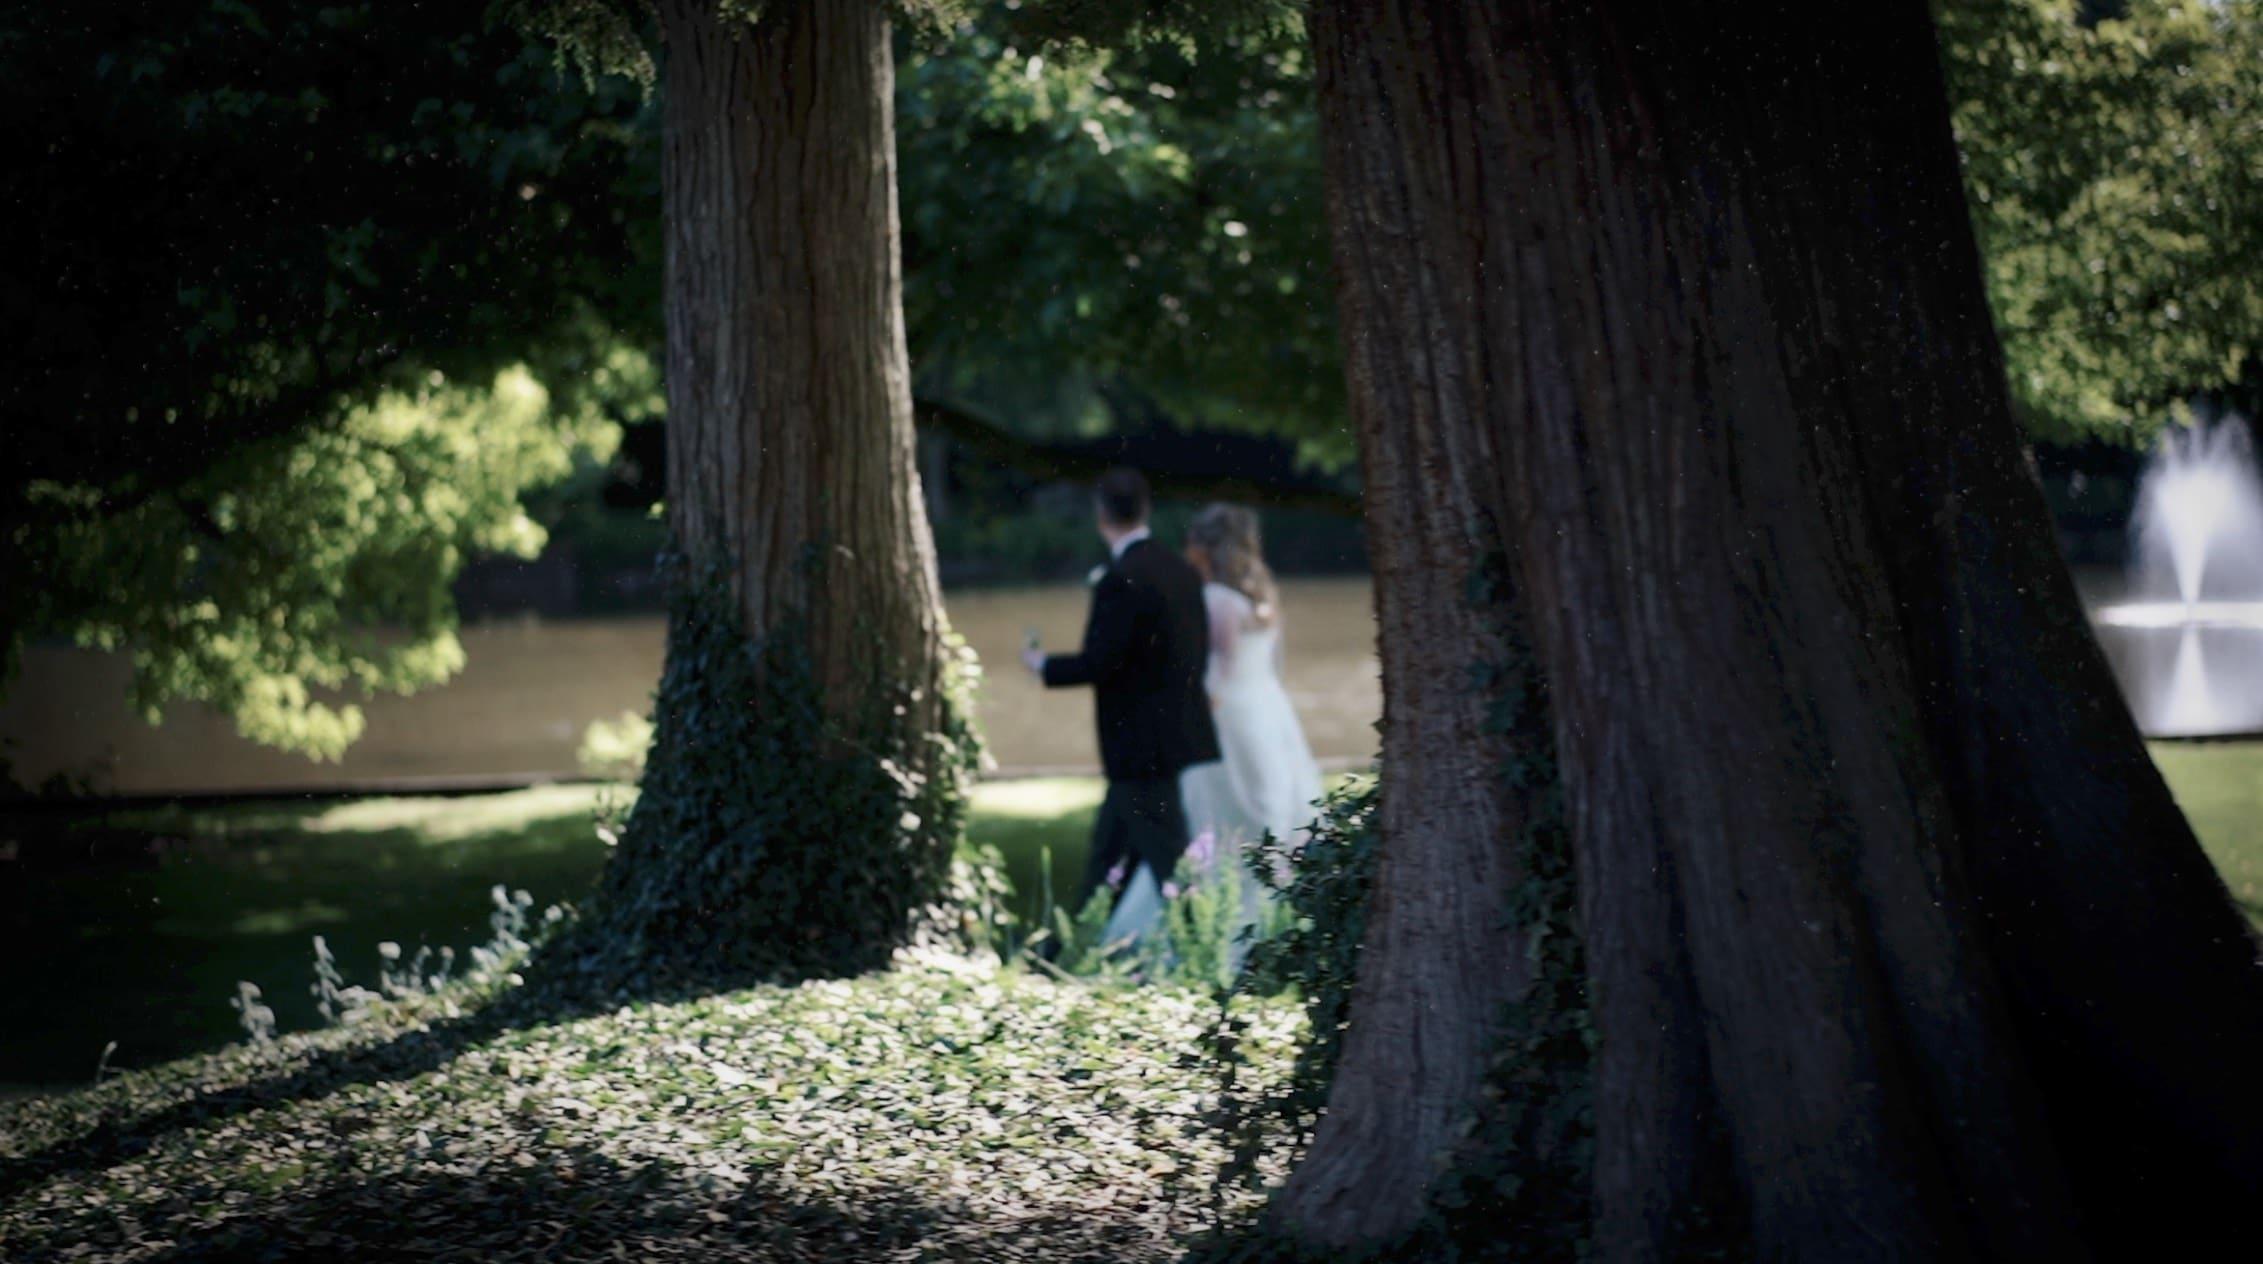 The Wedding of Hayley & James